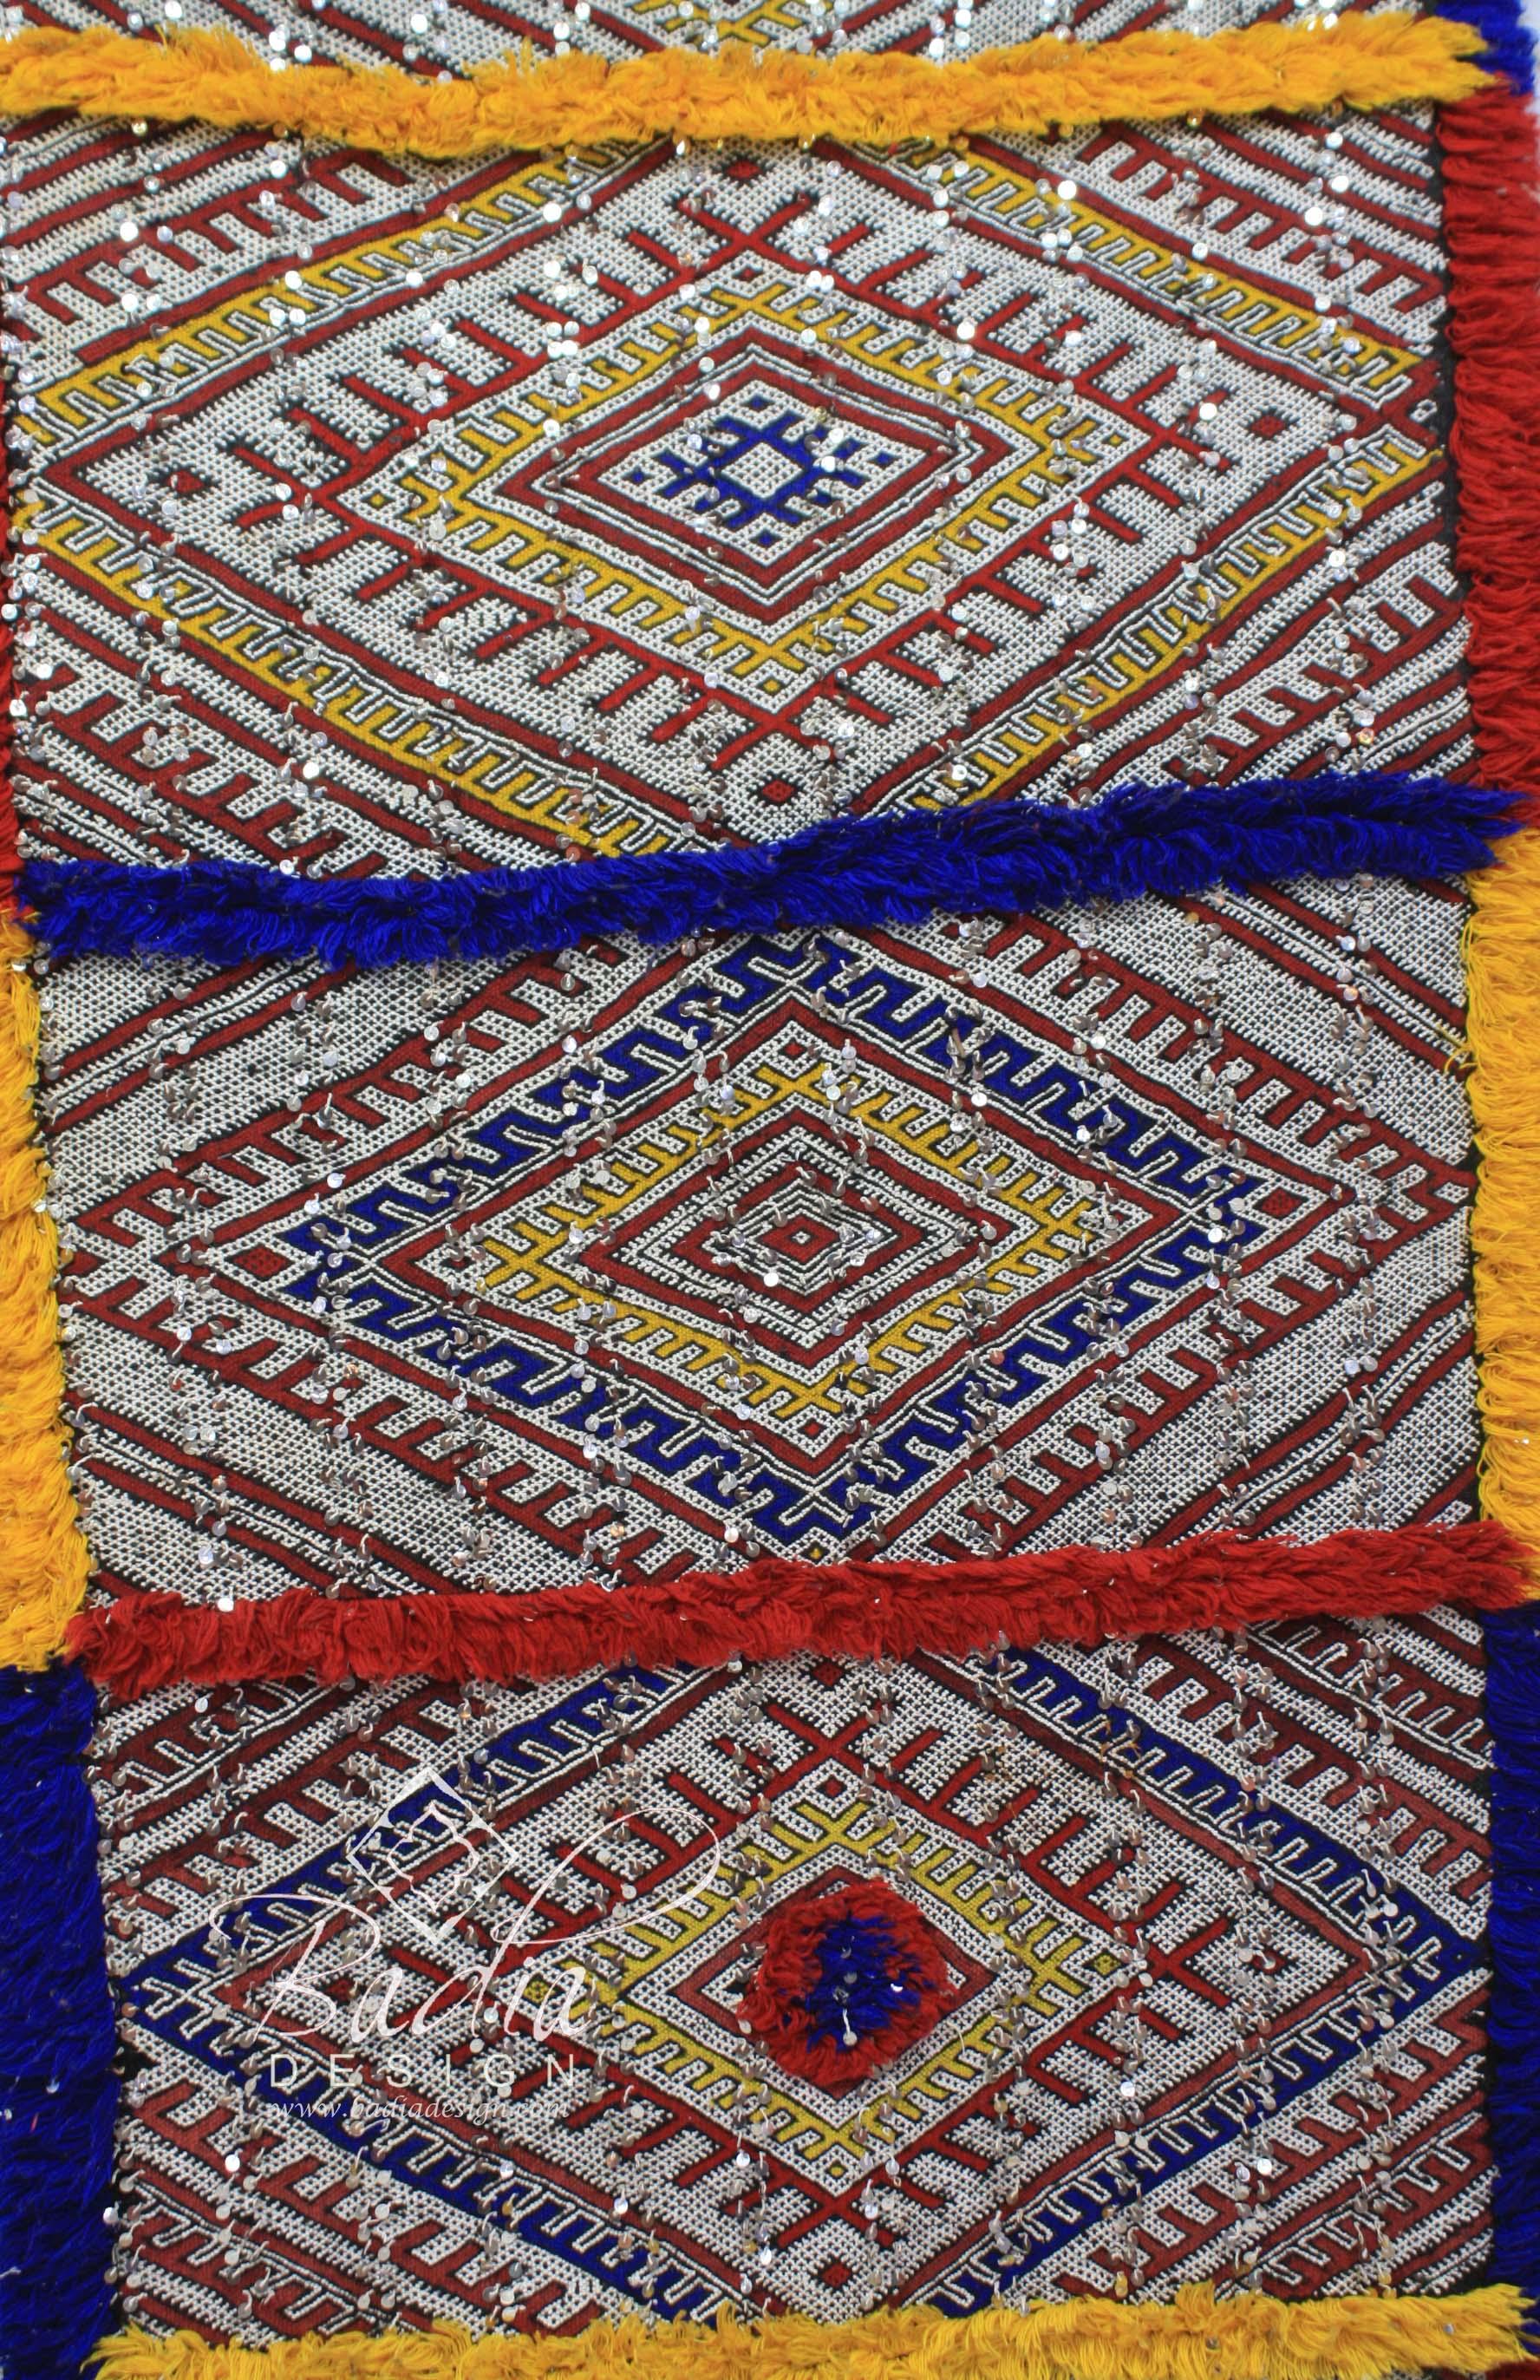 bright-color-moroccan-runner-rug-r870-2.jpg